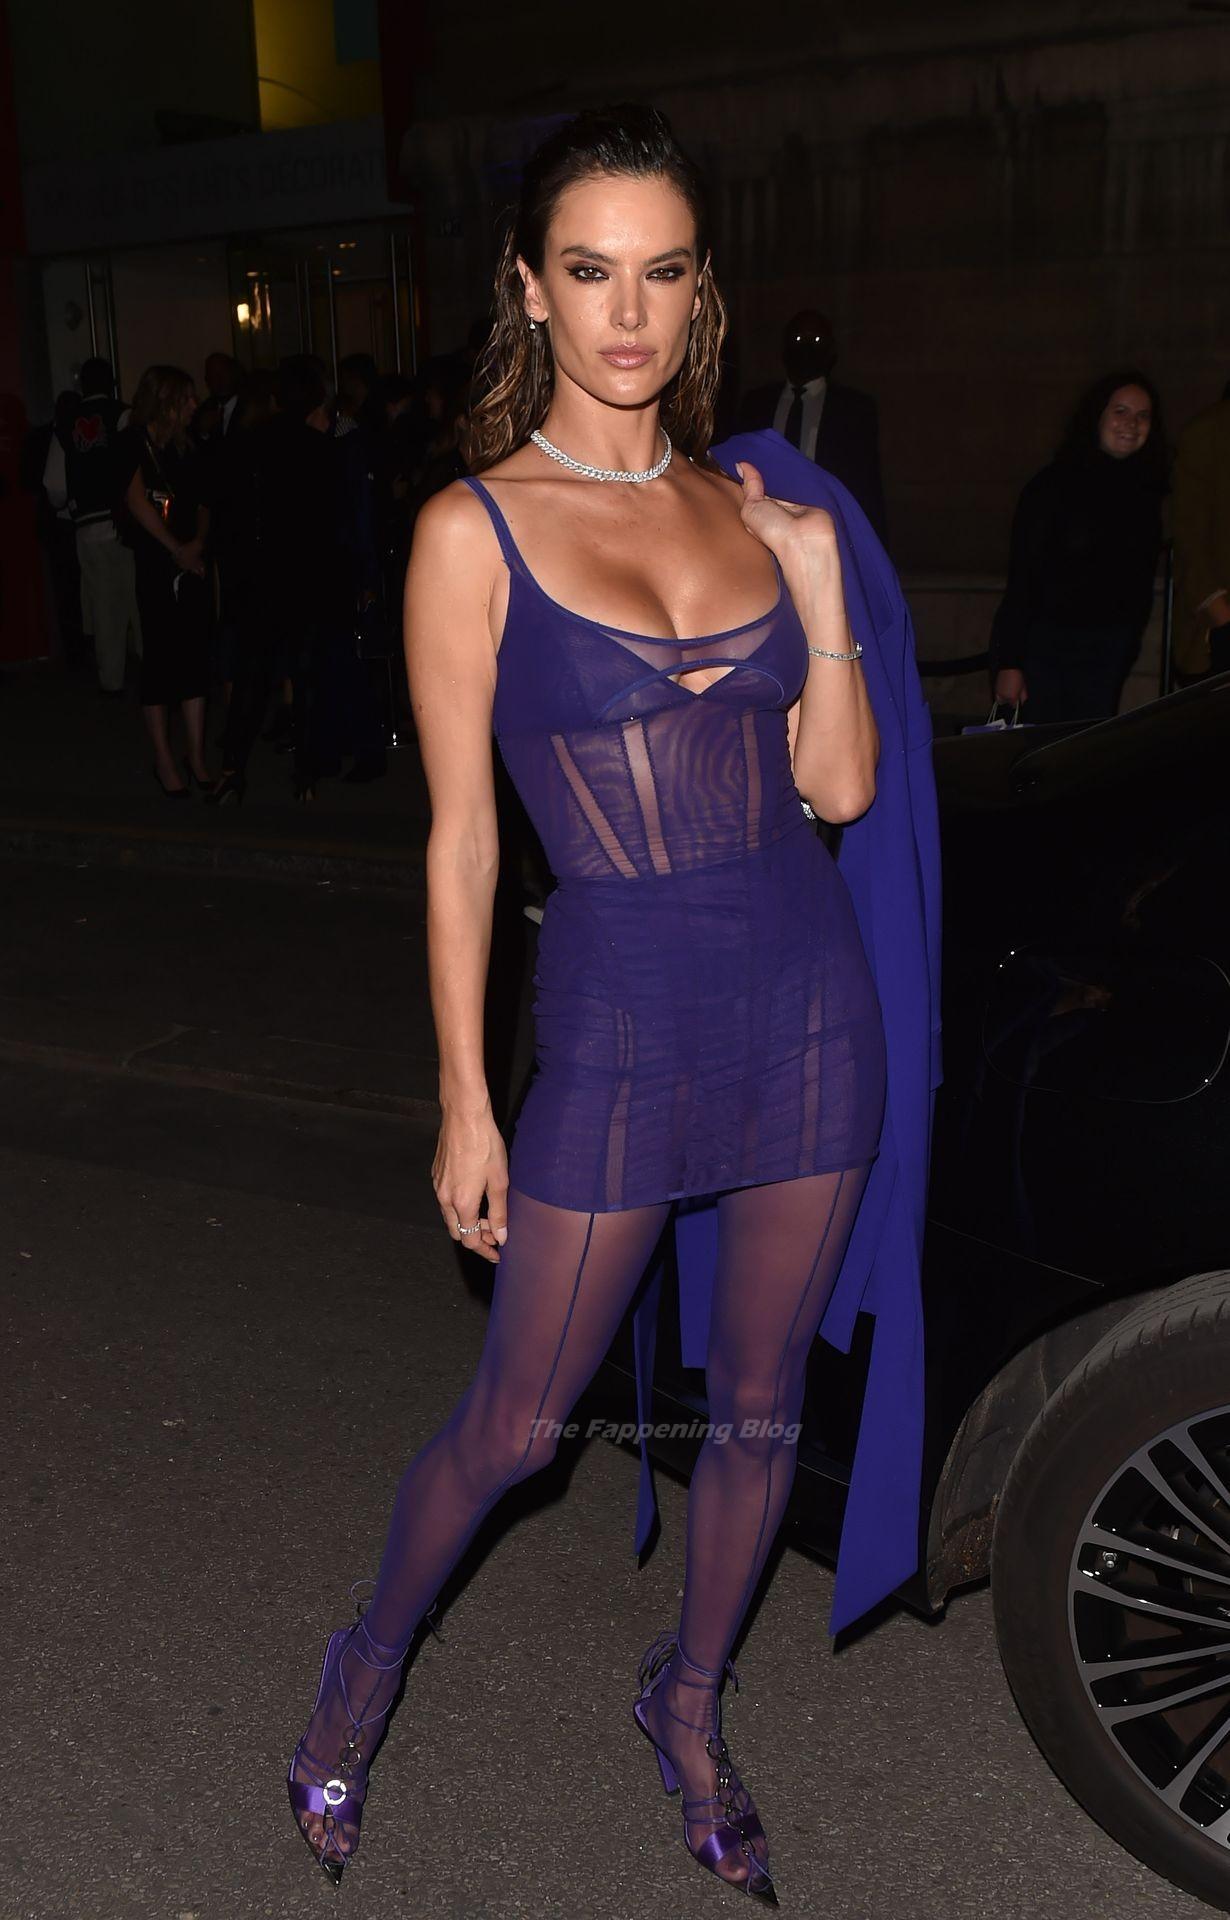 Alessandra-Ambrosio-Sexy-The-Fappening-Blog-84-1.jpg